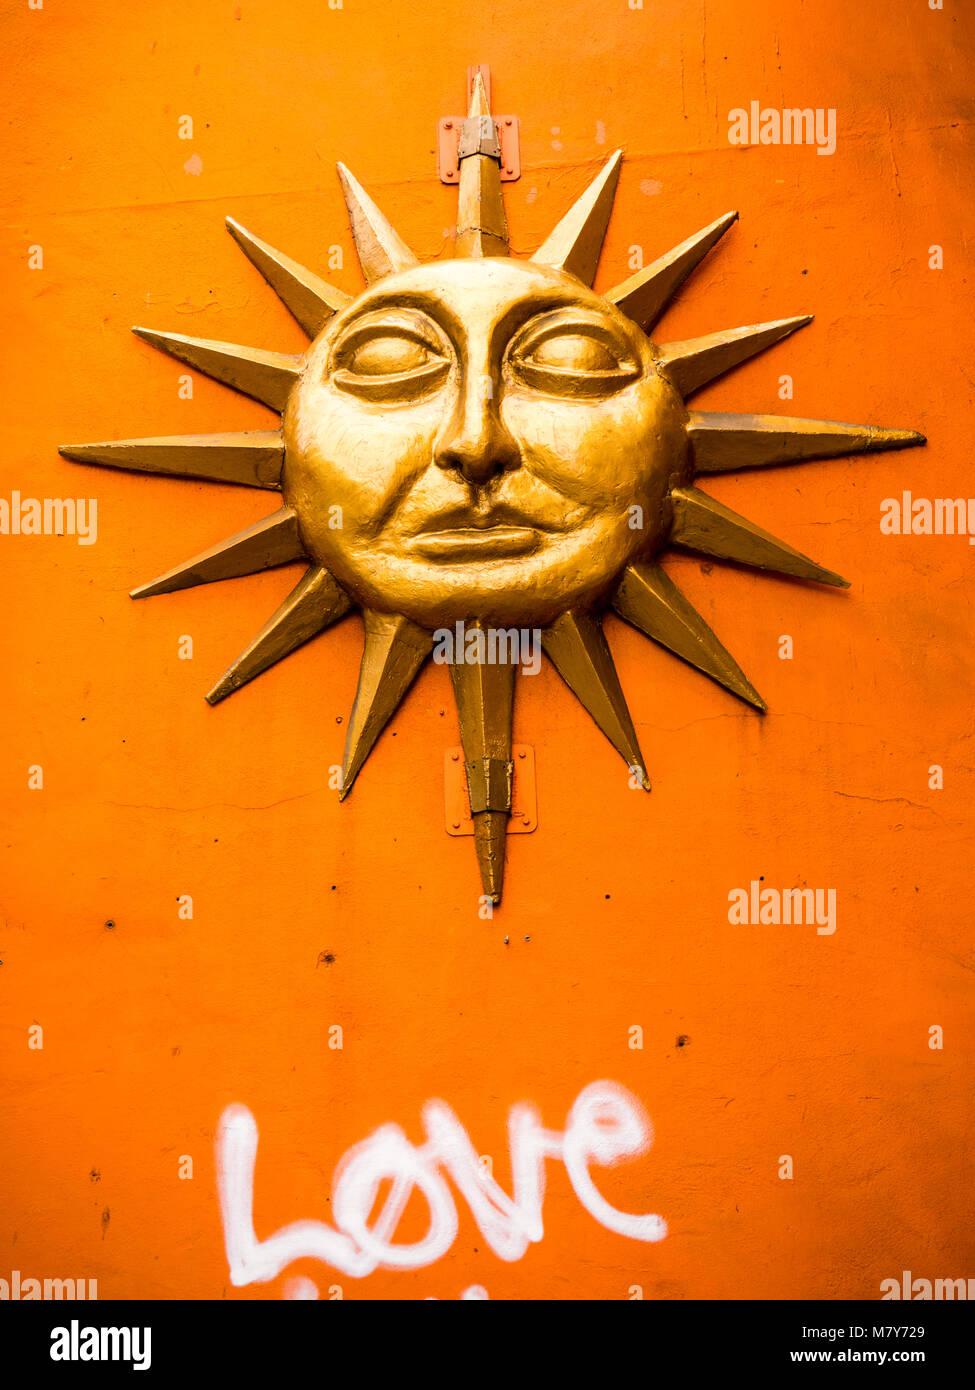 The Rising Sun Arts Centre, Reading, Berkshire, England. - Stock Image